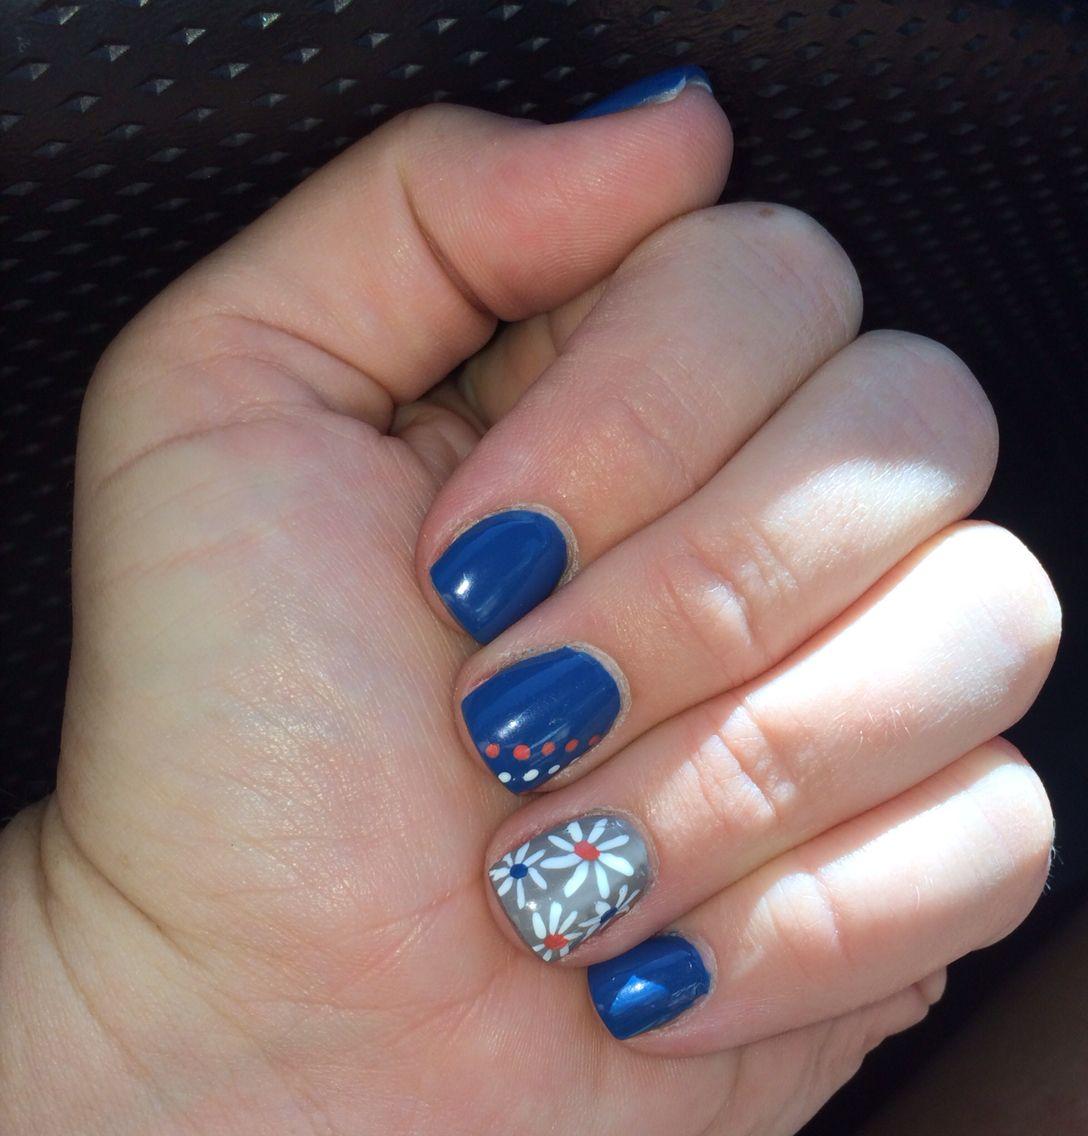 Blue, tan-grey, and peach nails with white daisies - Nail art ...